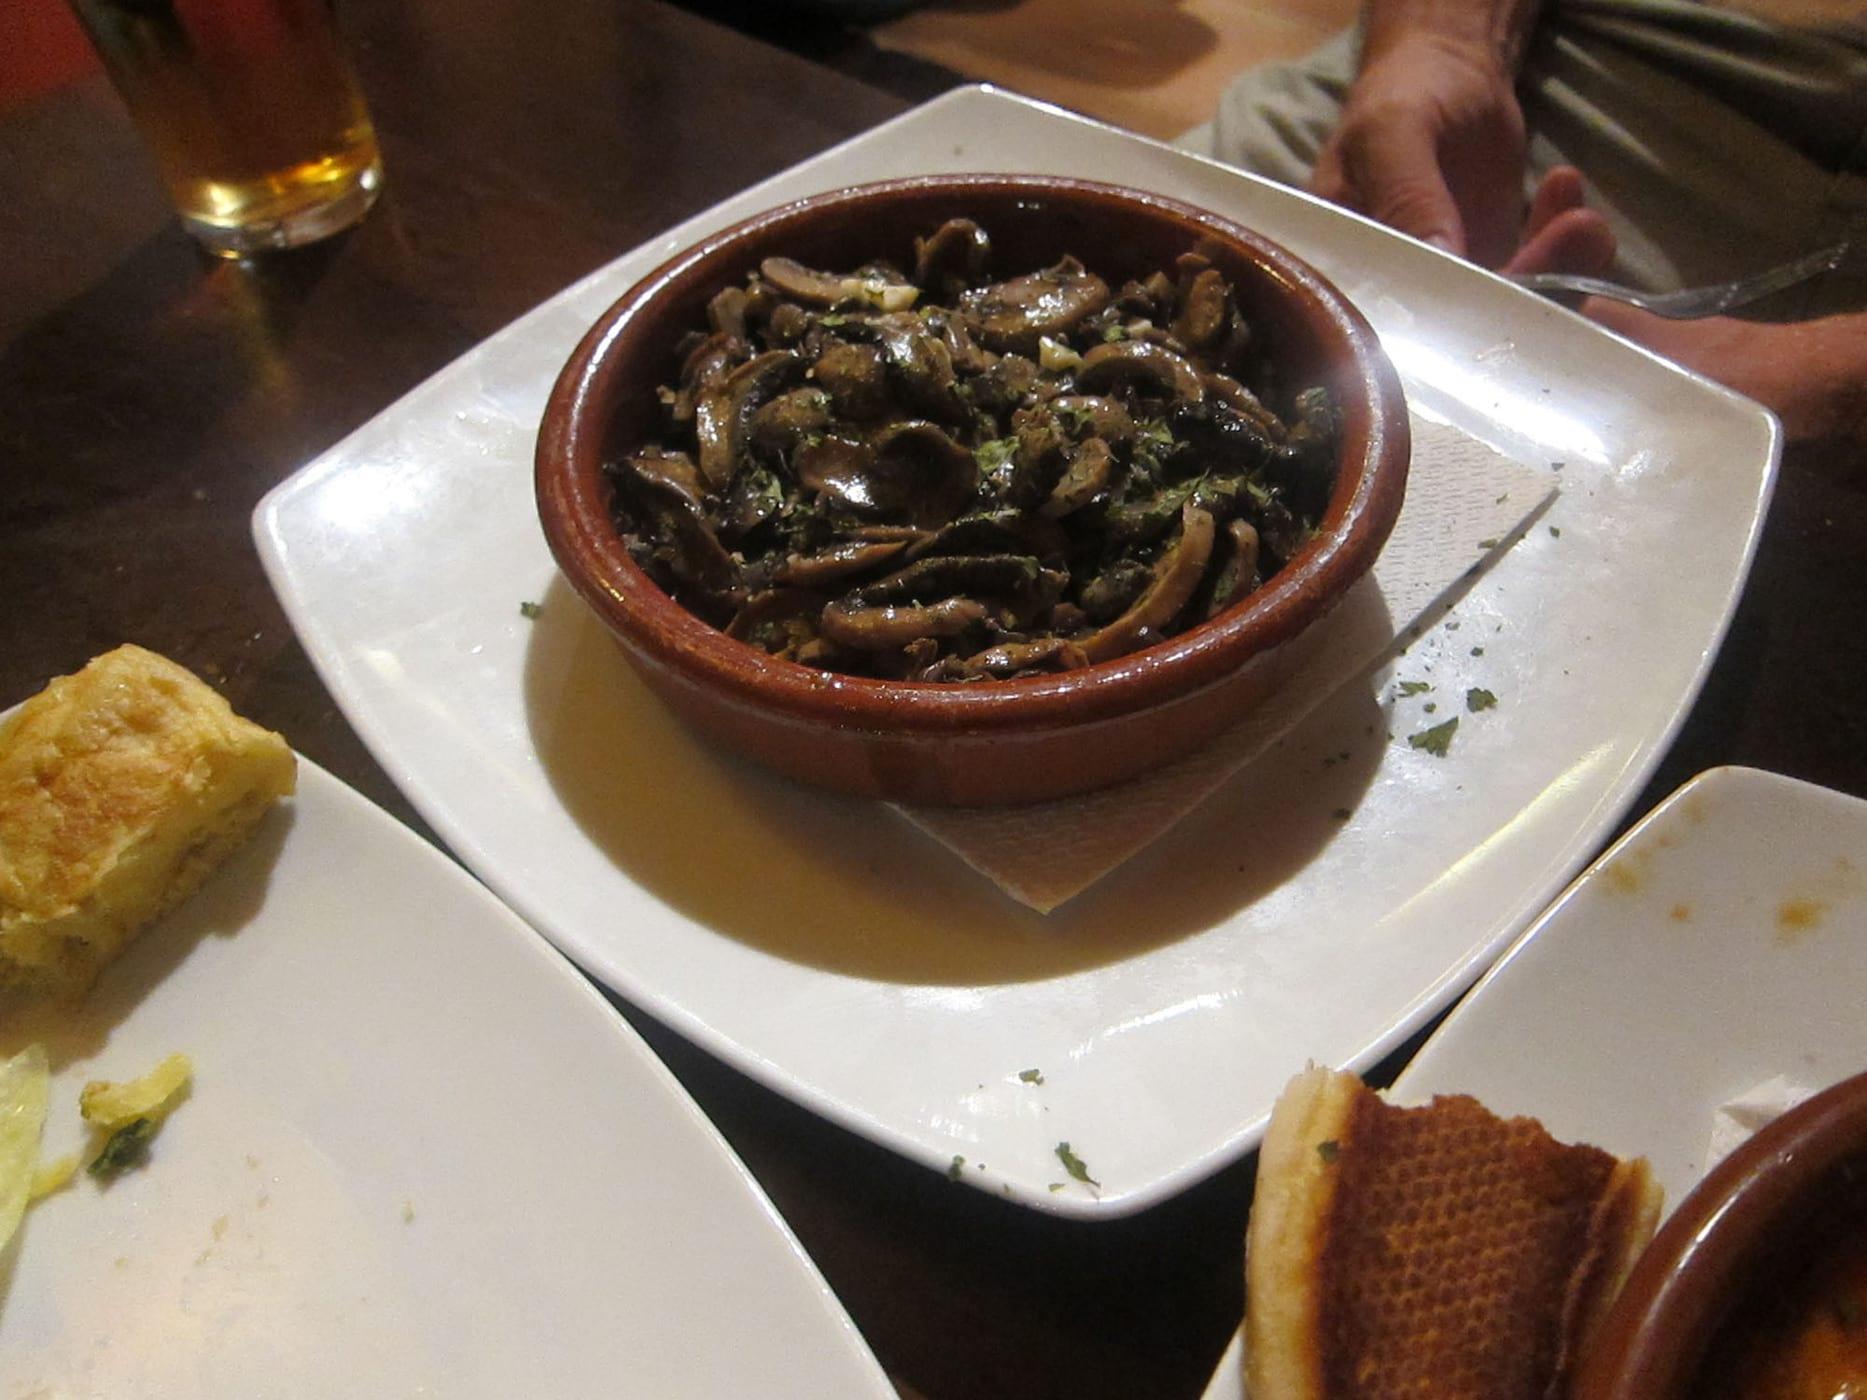 Mushroom tapas in Granada, Spain.